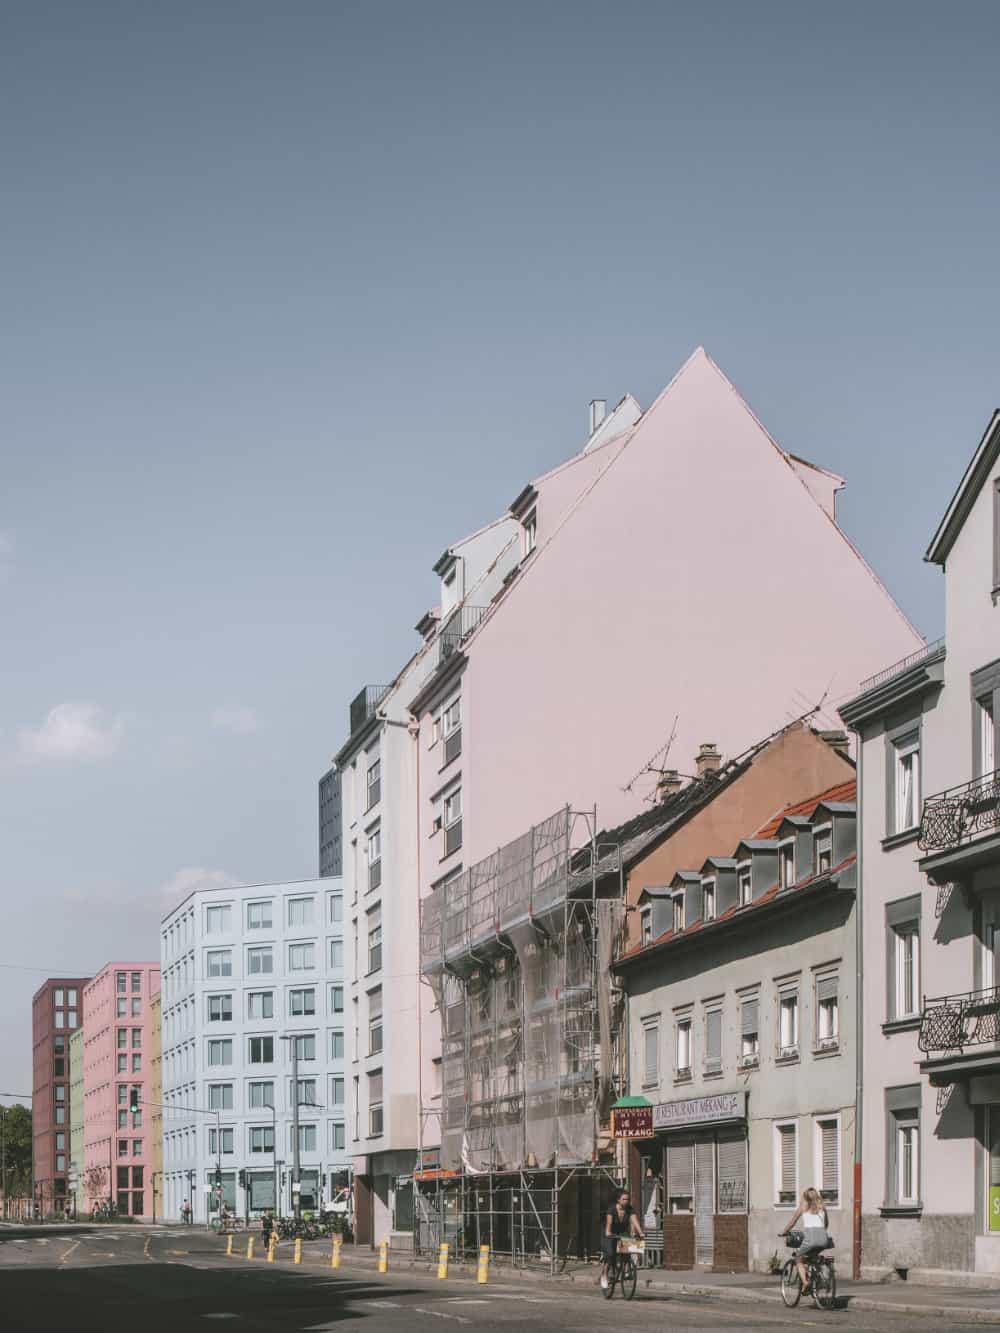 From the city center, the Saint‐Urbain block asserts itself as an autonomous assembly